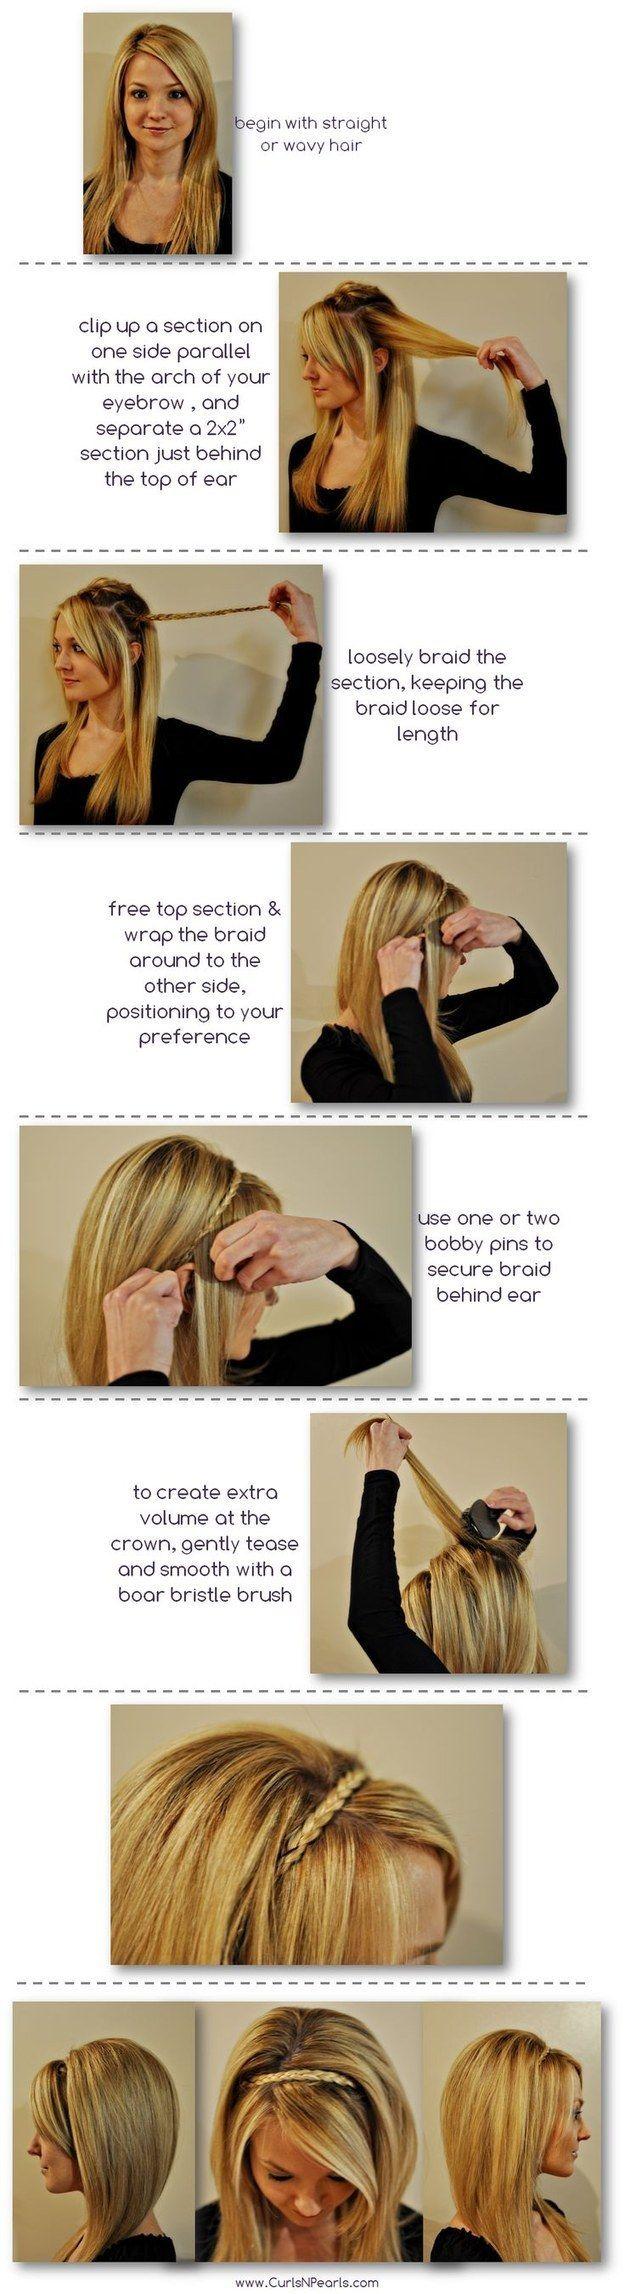 The Headband Braid   23 Creative Braid Tutorials That Are Deceptively Easy